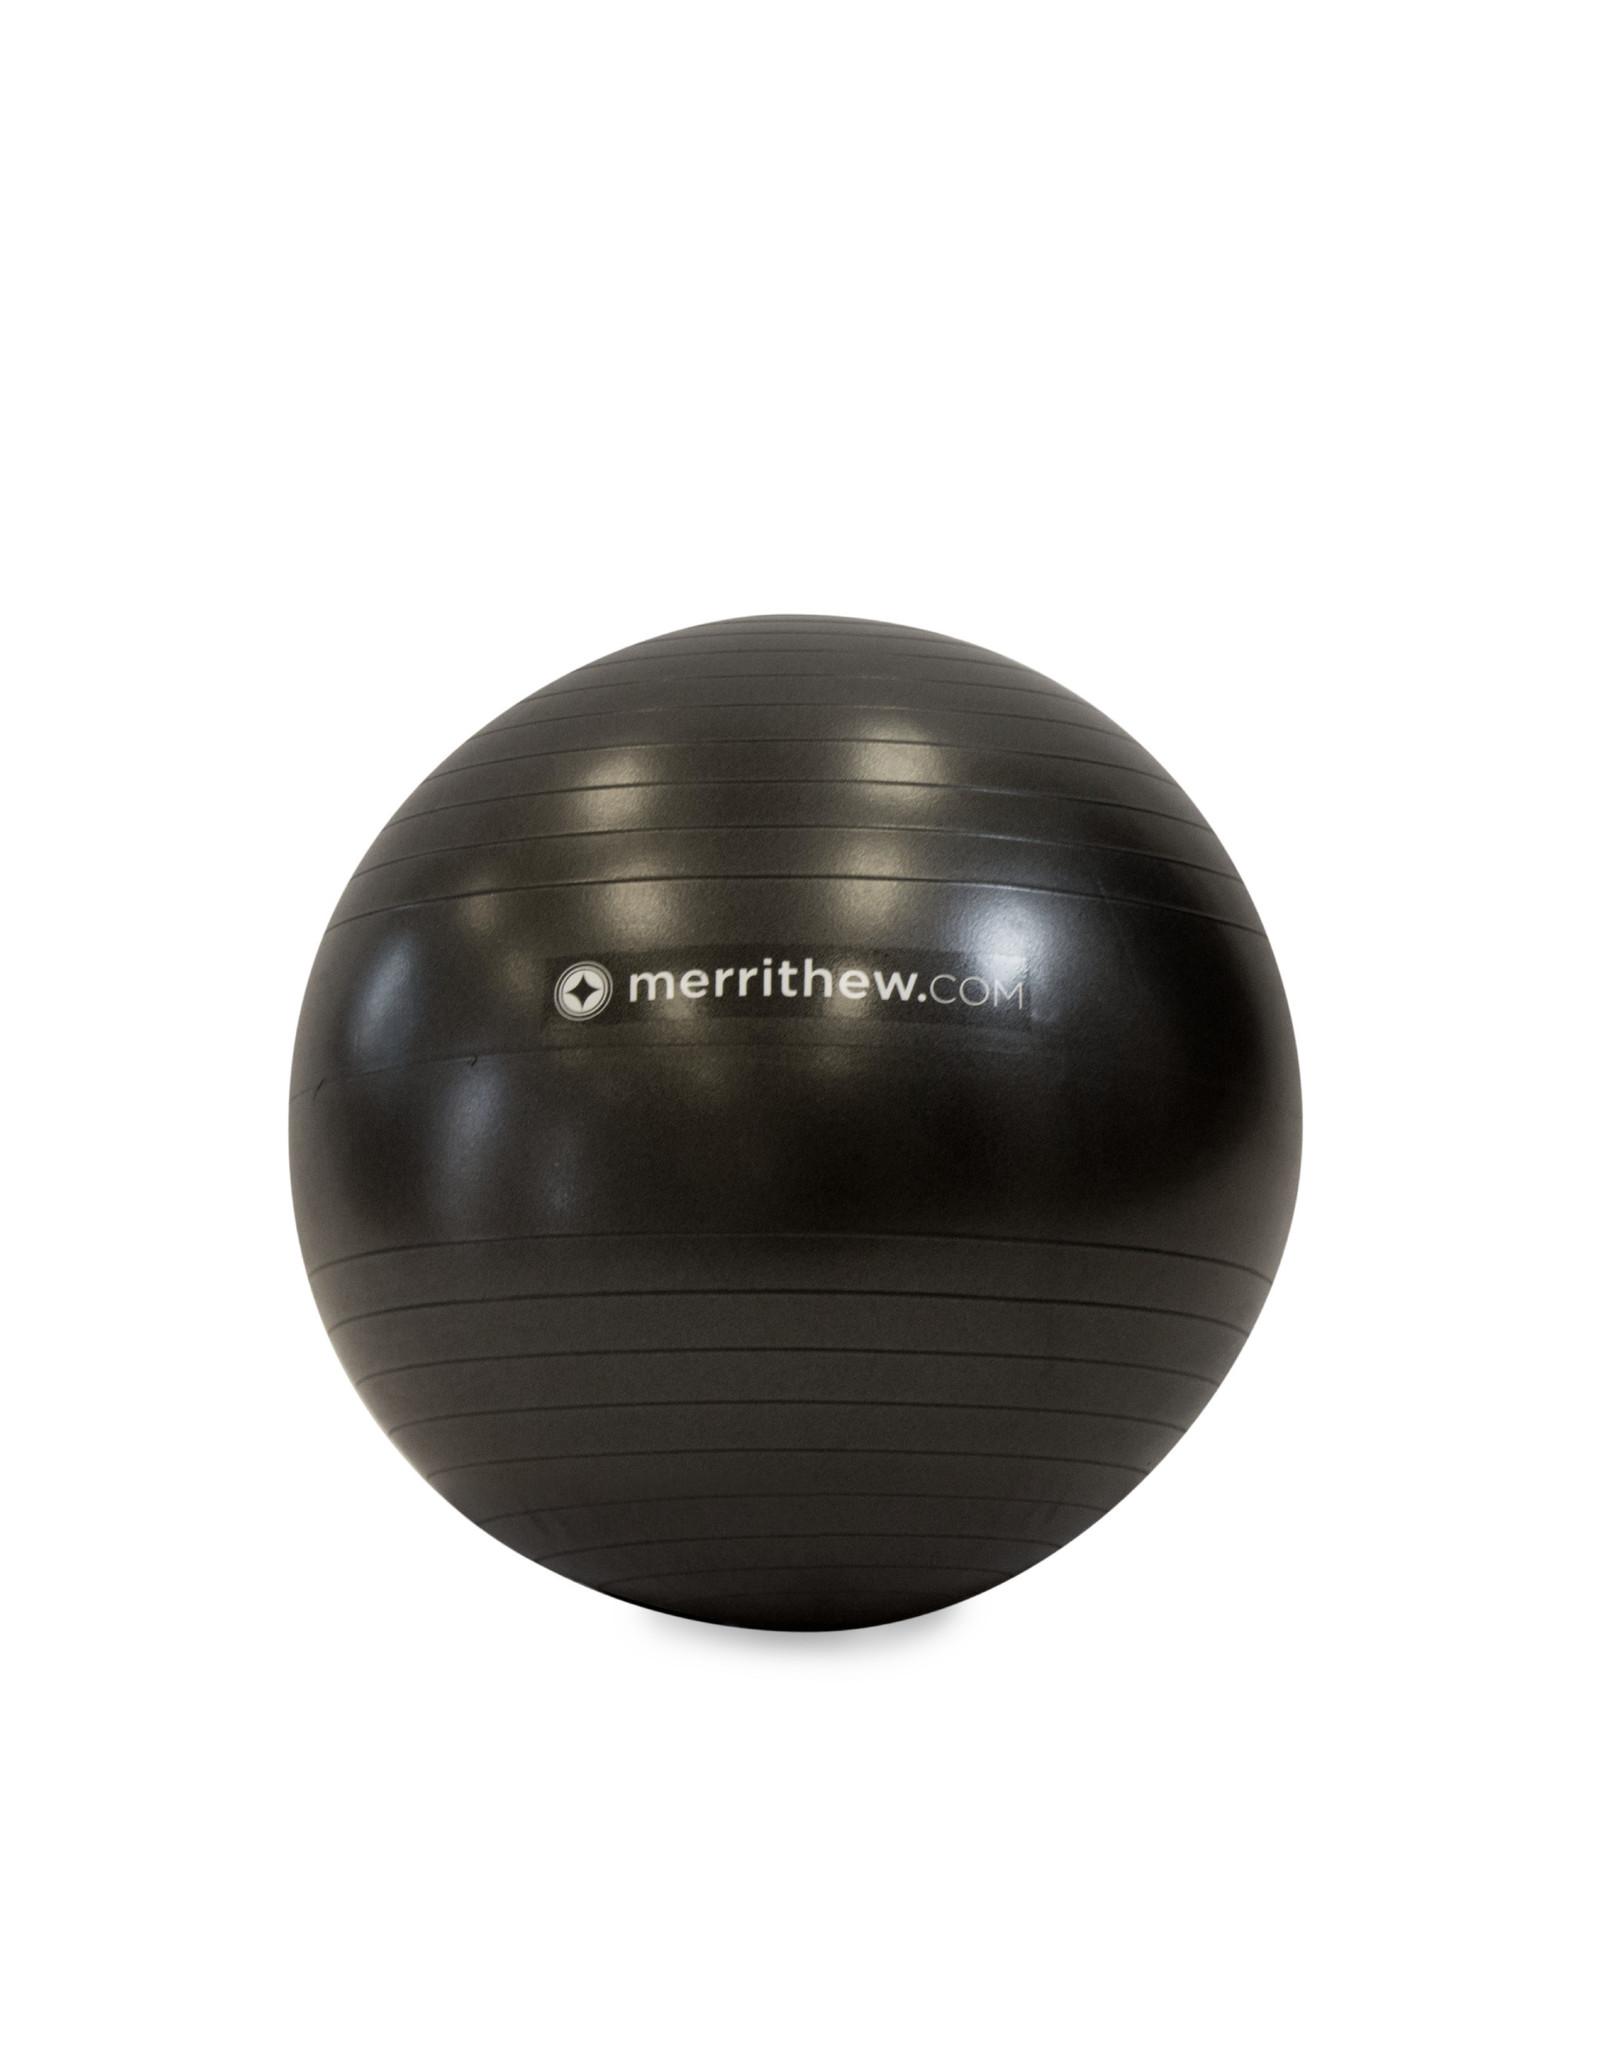 MERRITHEW Ball - Stability Ball™ Plus 55cm (black) with pump